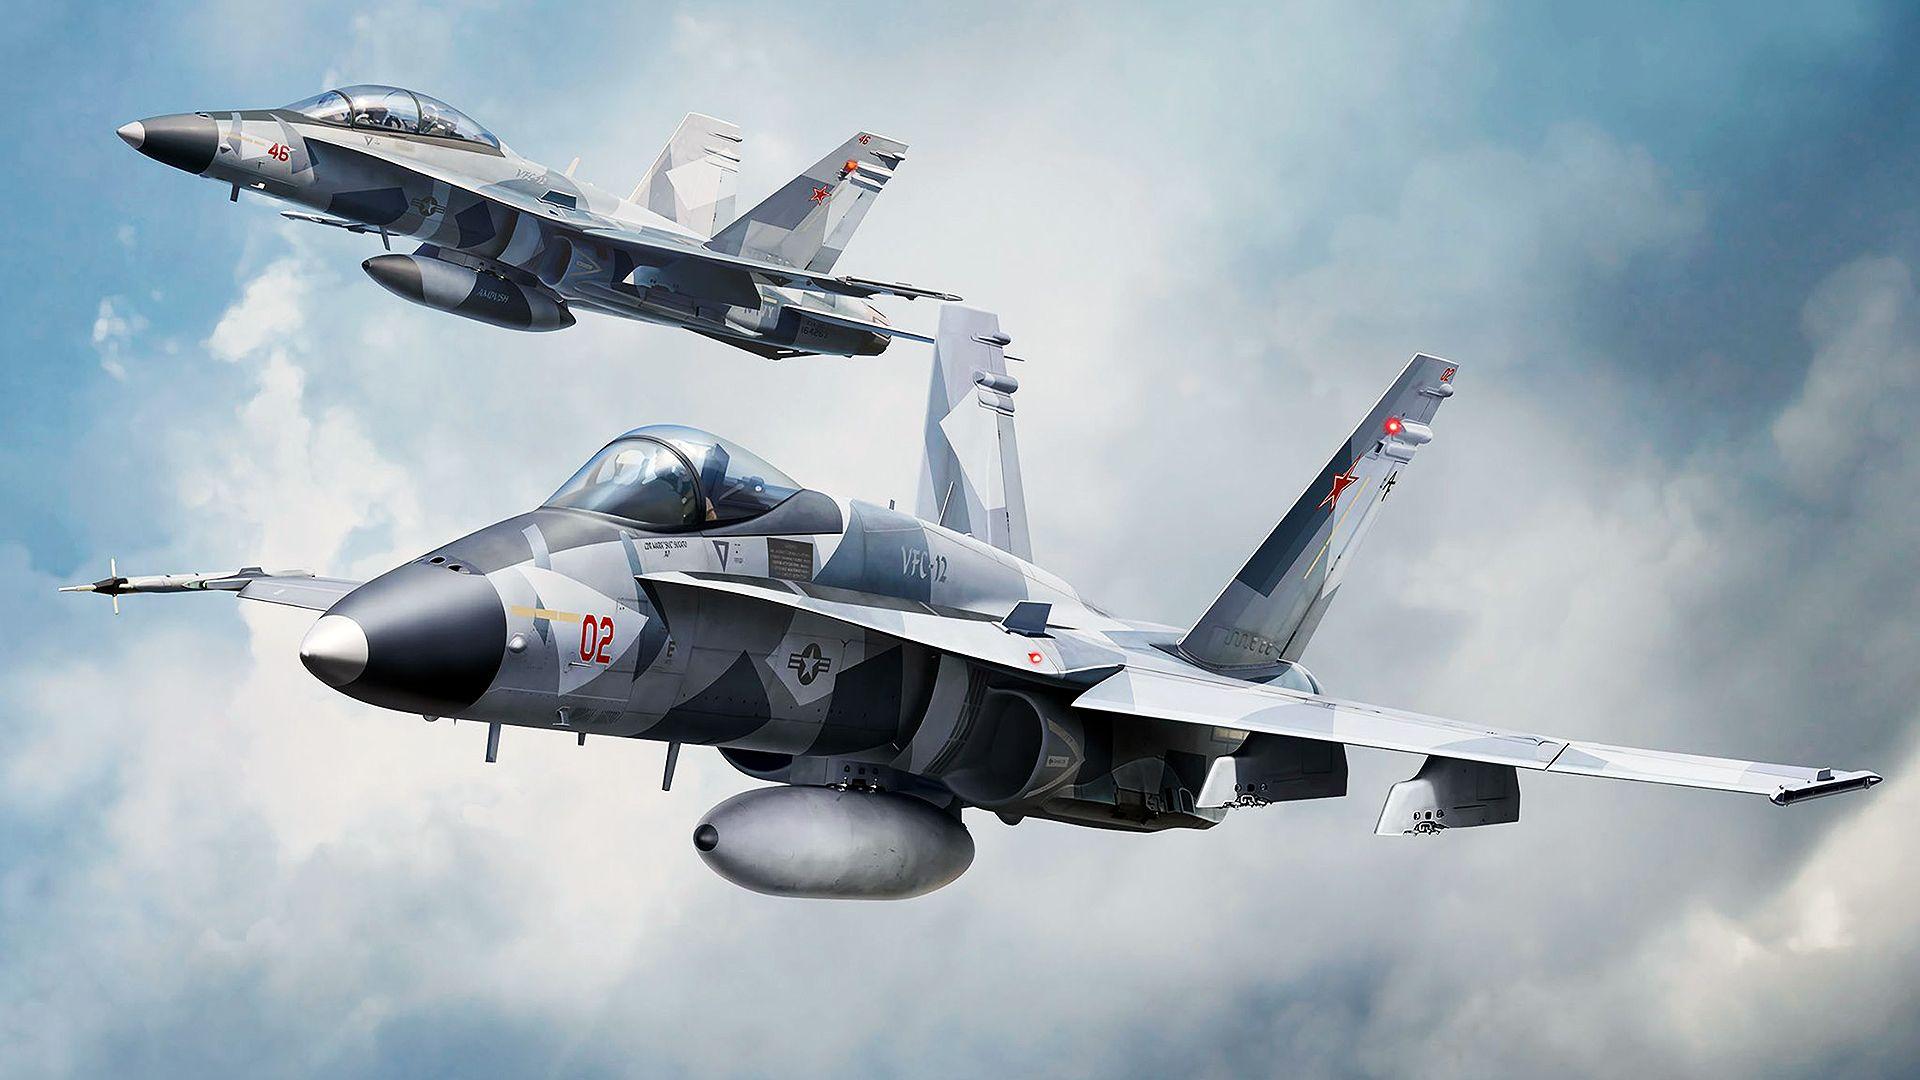 Pin By Jason Hopelight On Aircraft Art In 2020 Aircraft Fighter Jets Aircraft Art